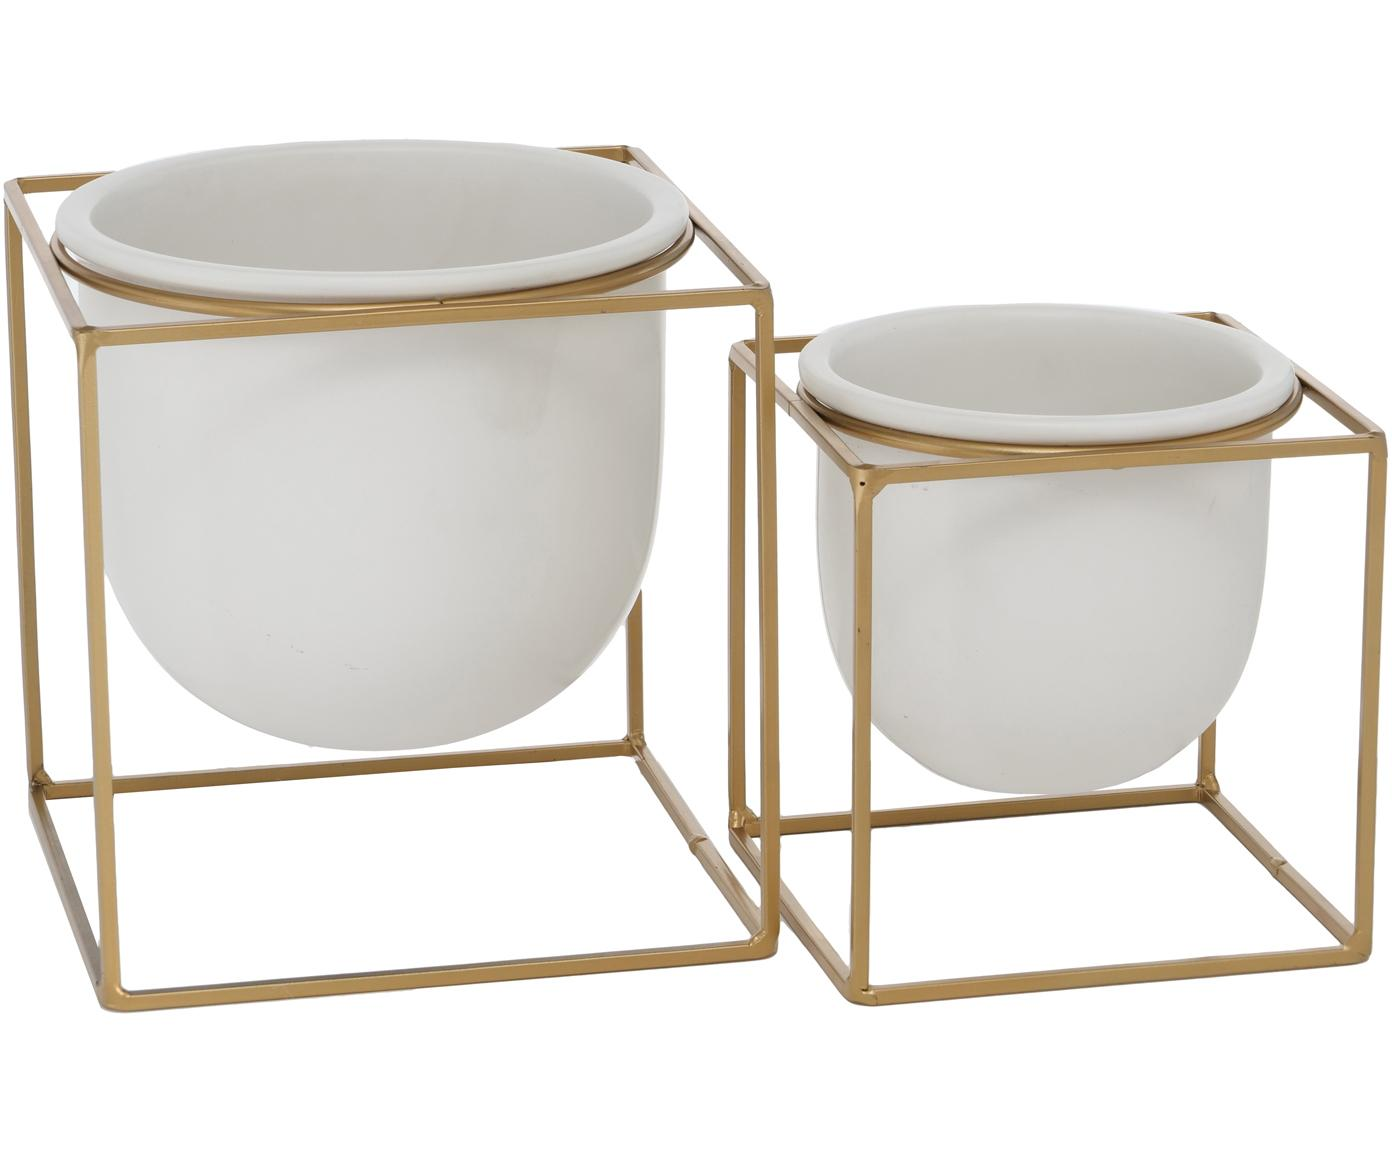 Set 2 portavasi con struttura in metallo Kumbo, Struttura: metallo rivestito, Bianco, ottonato, Set in varie misure